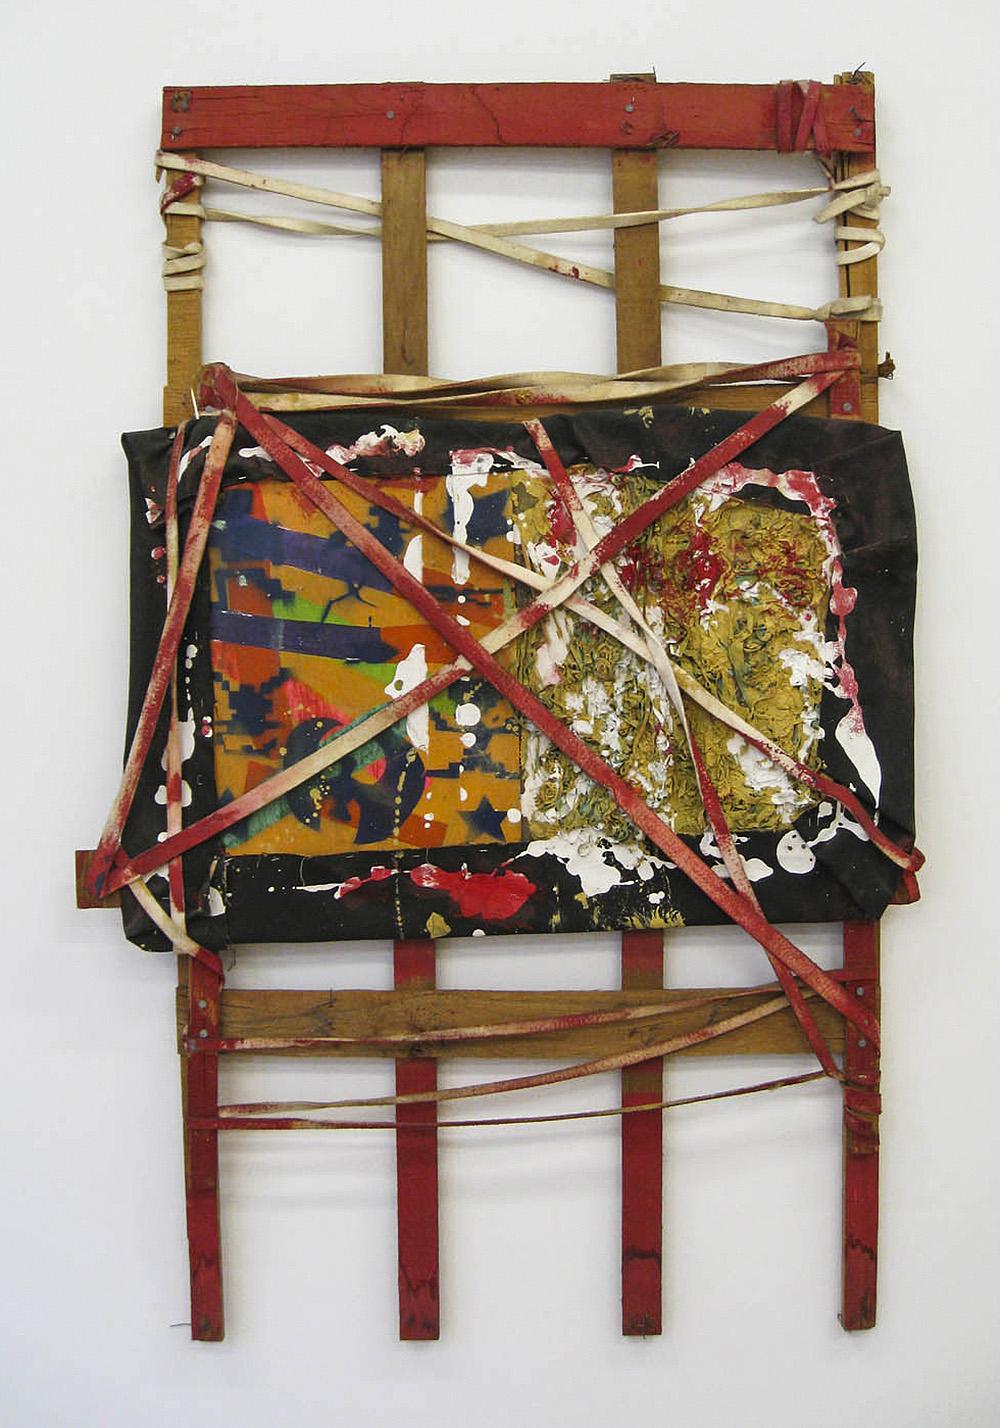 Untitled | 1987 | Lattenkonstruktion, Leinwand, Öl, verschiedene Textilien, Holz | 165 x 106,5 x 8 cm